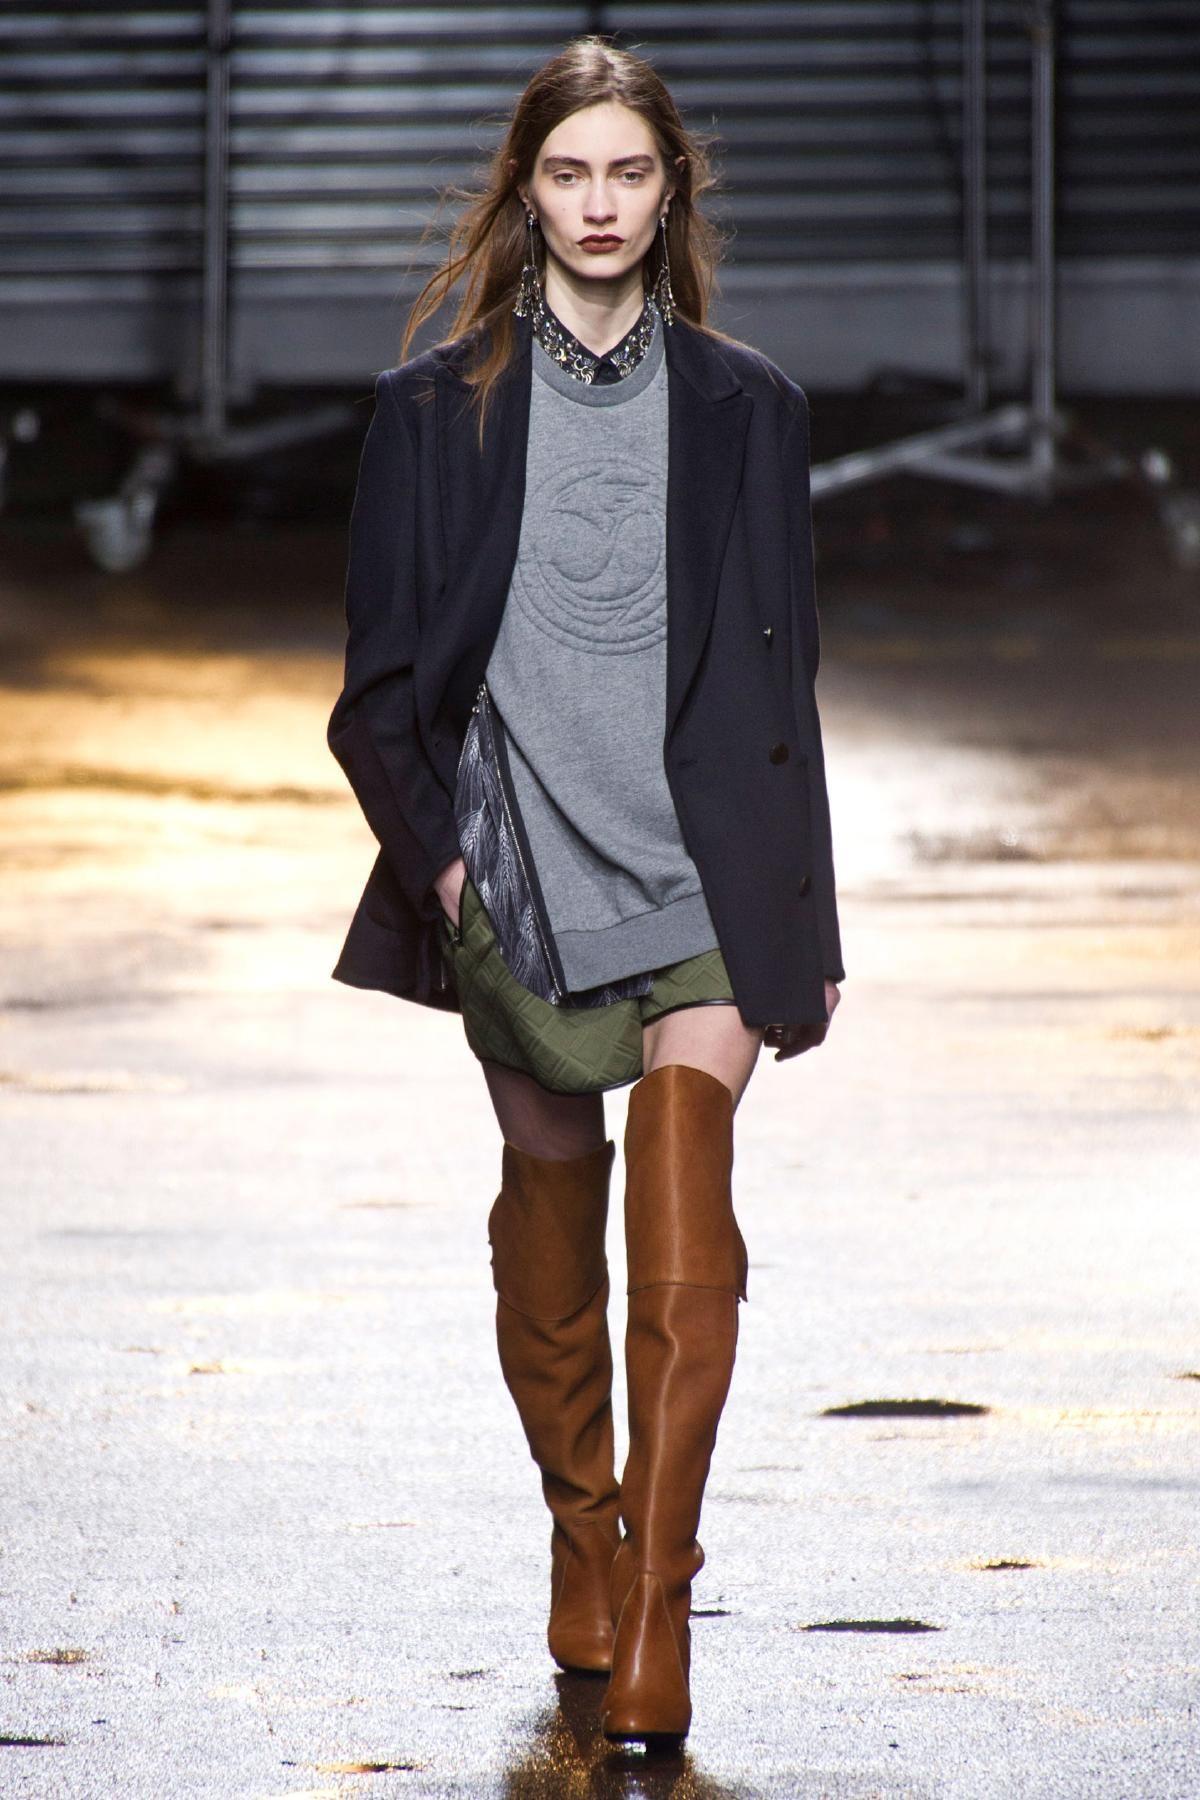 Karen Walker FallWinter 2013-2014 RTW – New York Fashion Week Karen Walker FallWinter 2013-2014 RTW – New York Fashion Week new picture